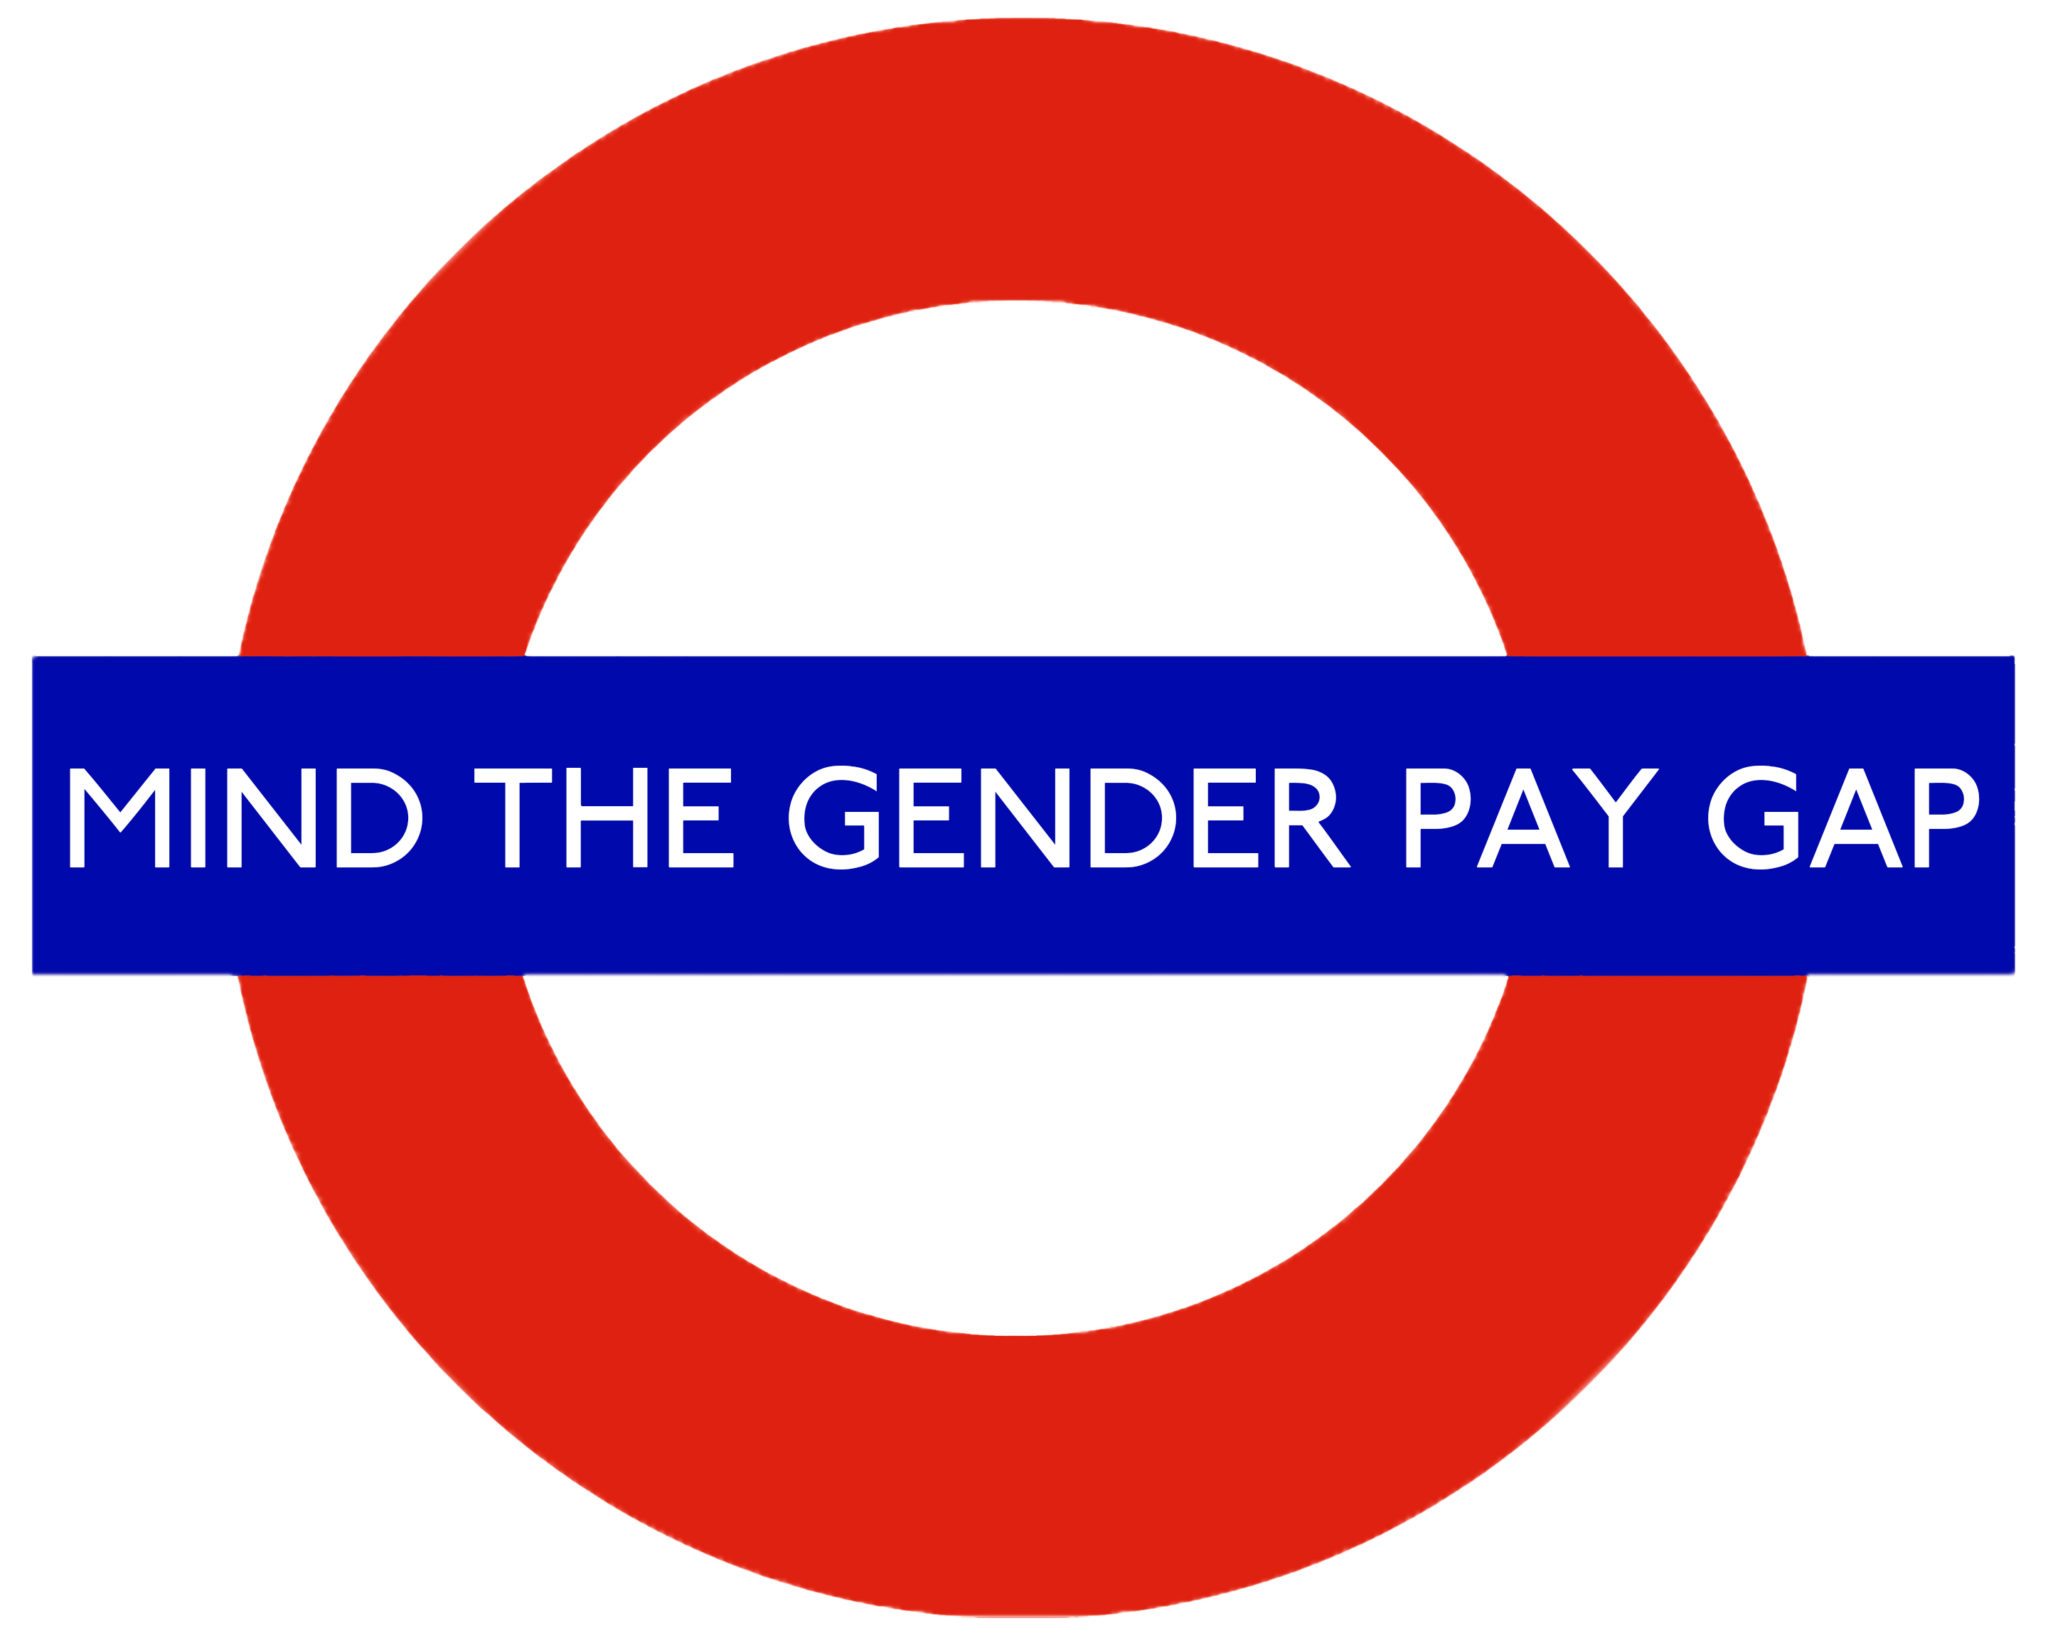 Are we making progress closing the Gender Pay Gap? - FMP Global UK